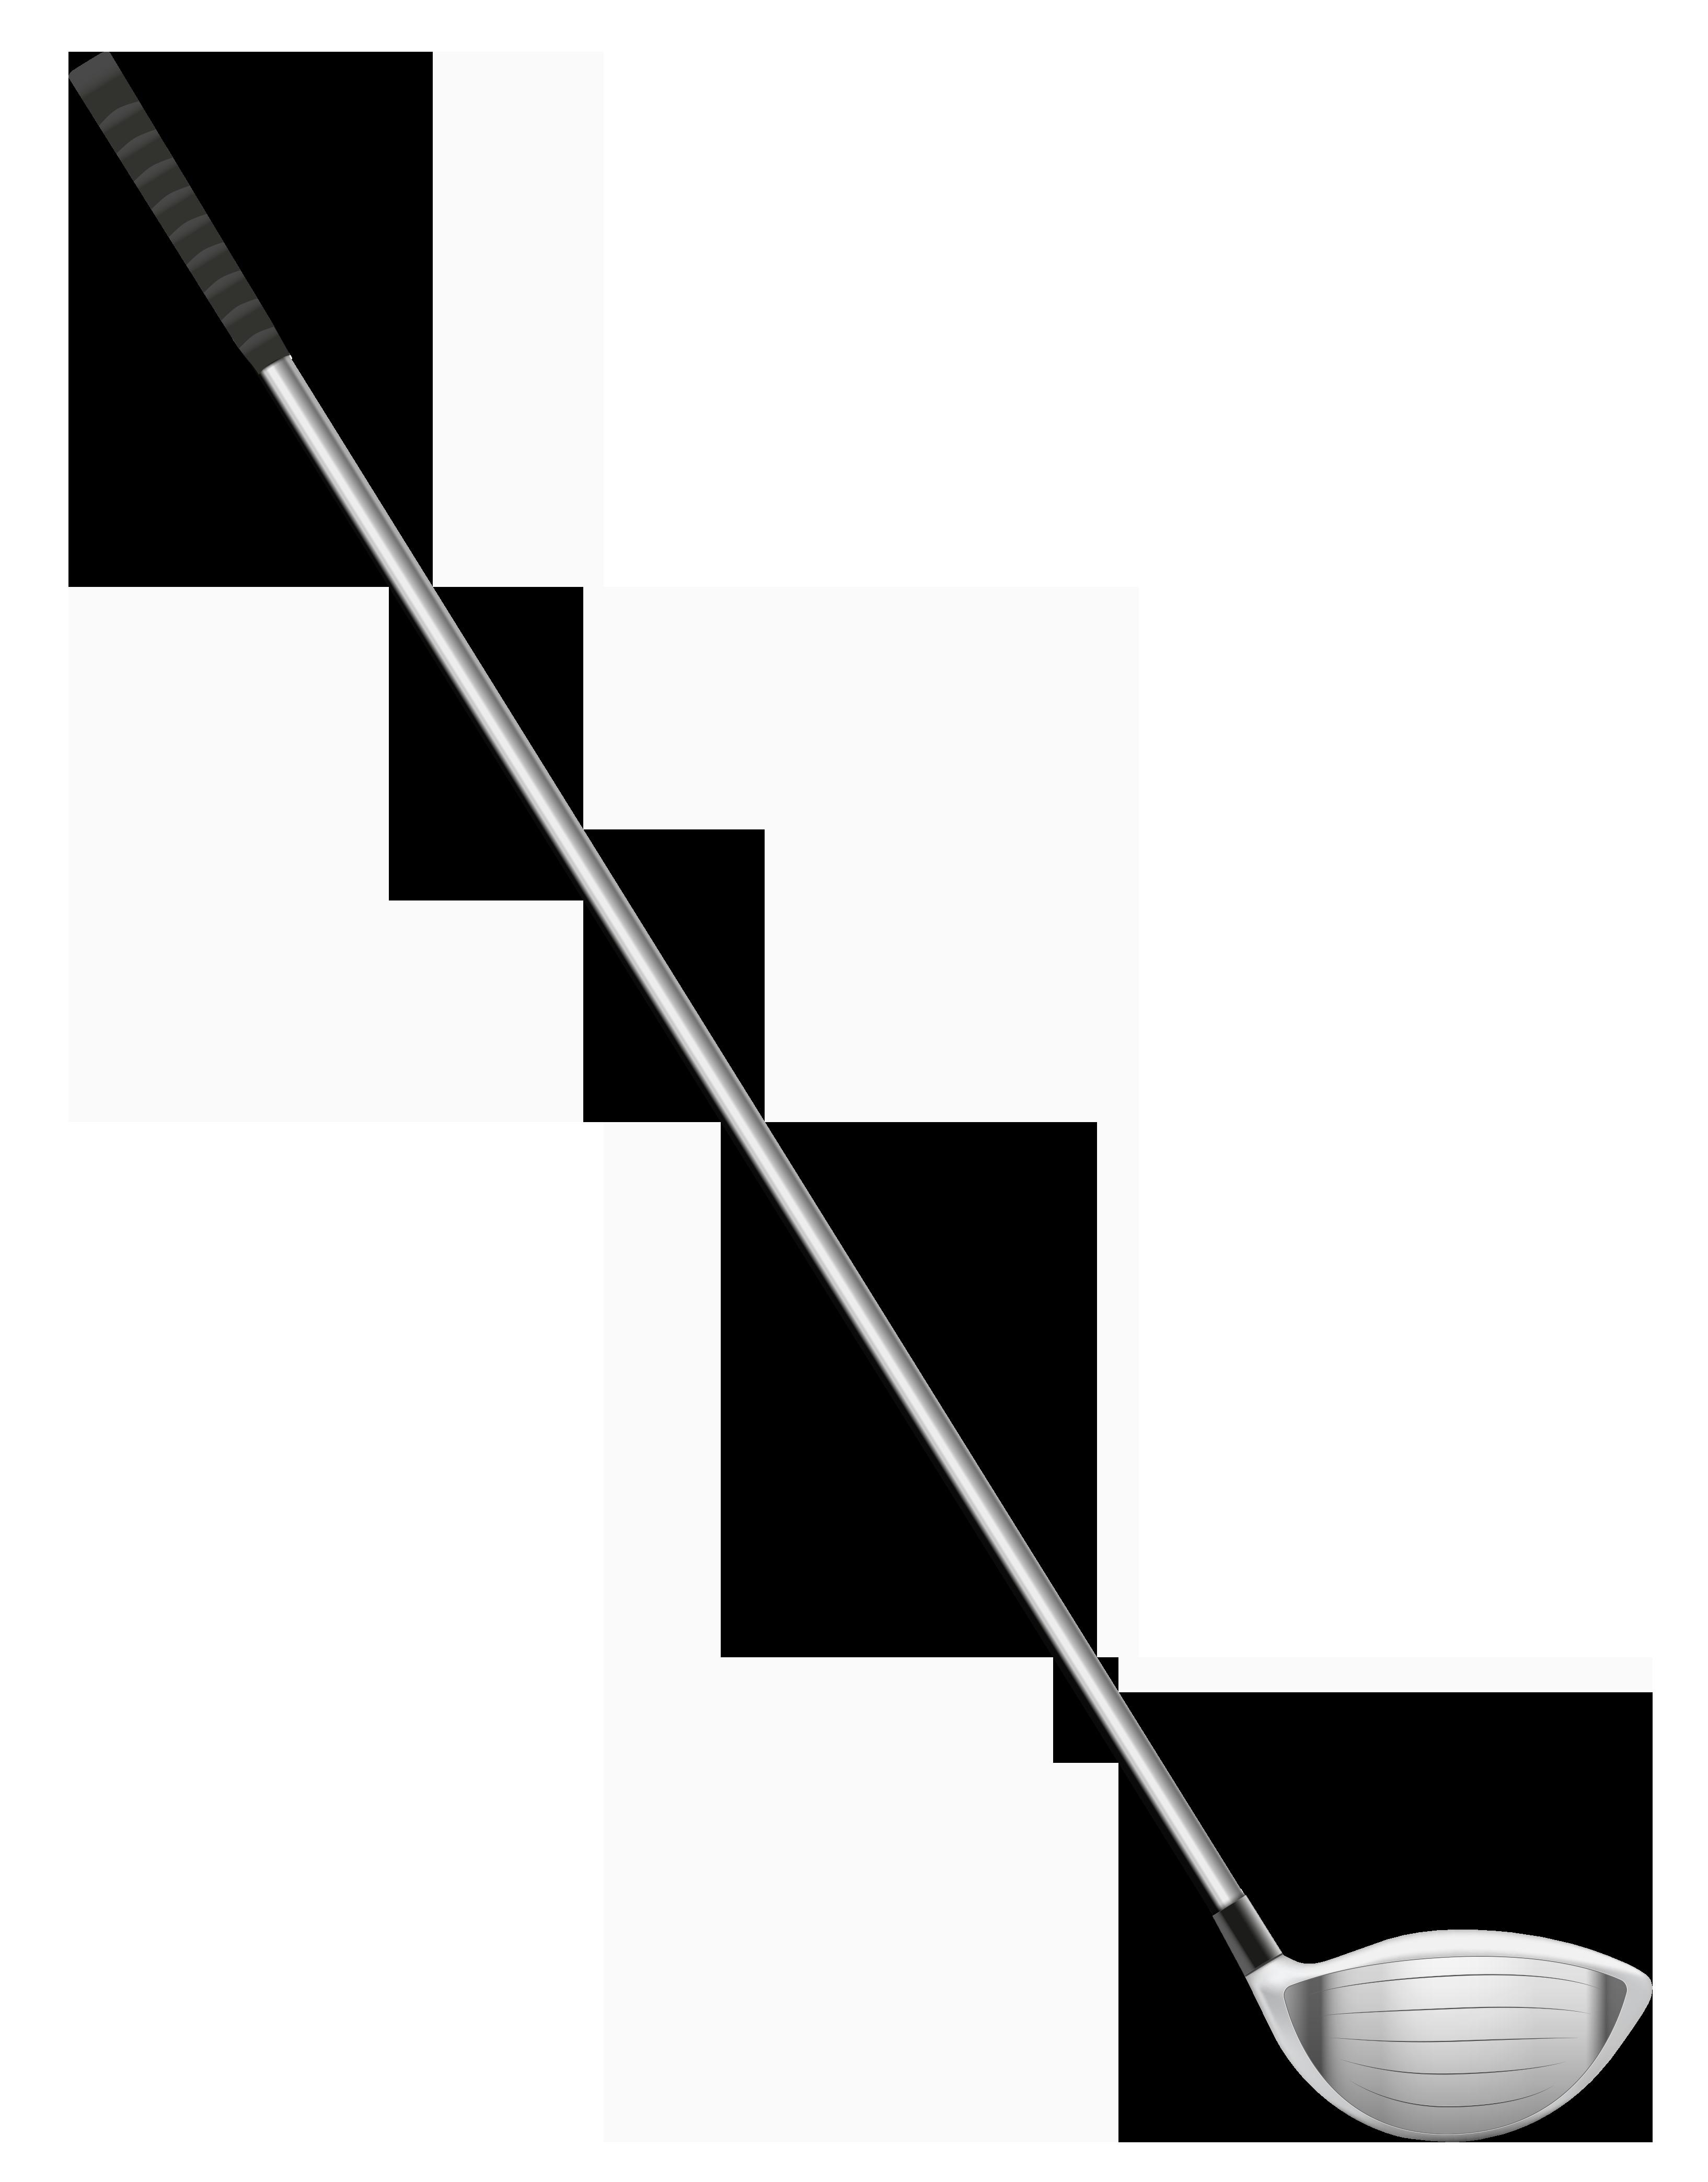 Cross golf clubs clipart image free Golf Club Clipart & Golf Club Clip Art Images - ClipartALL.com image free